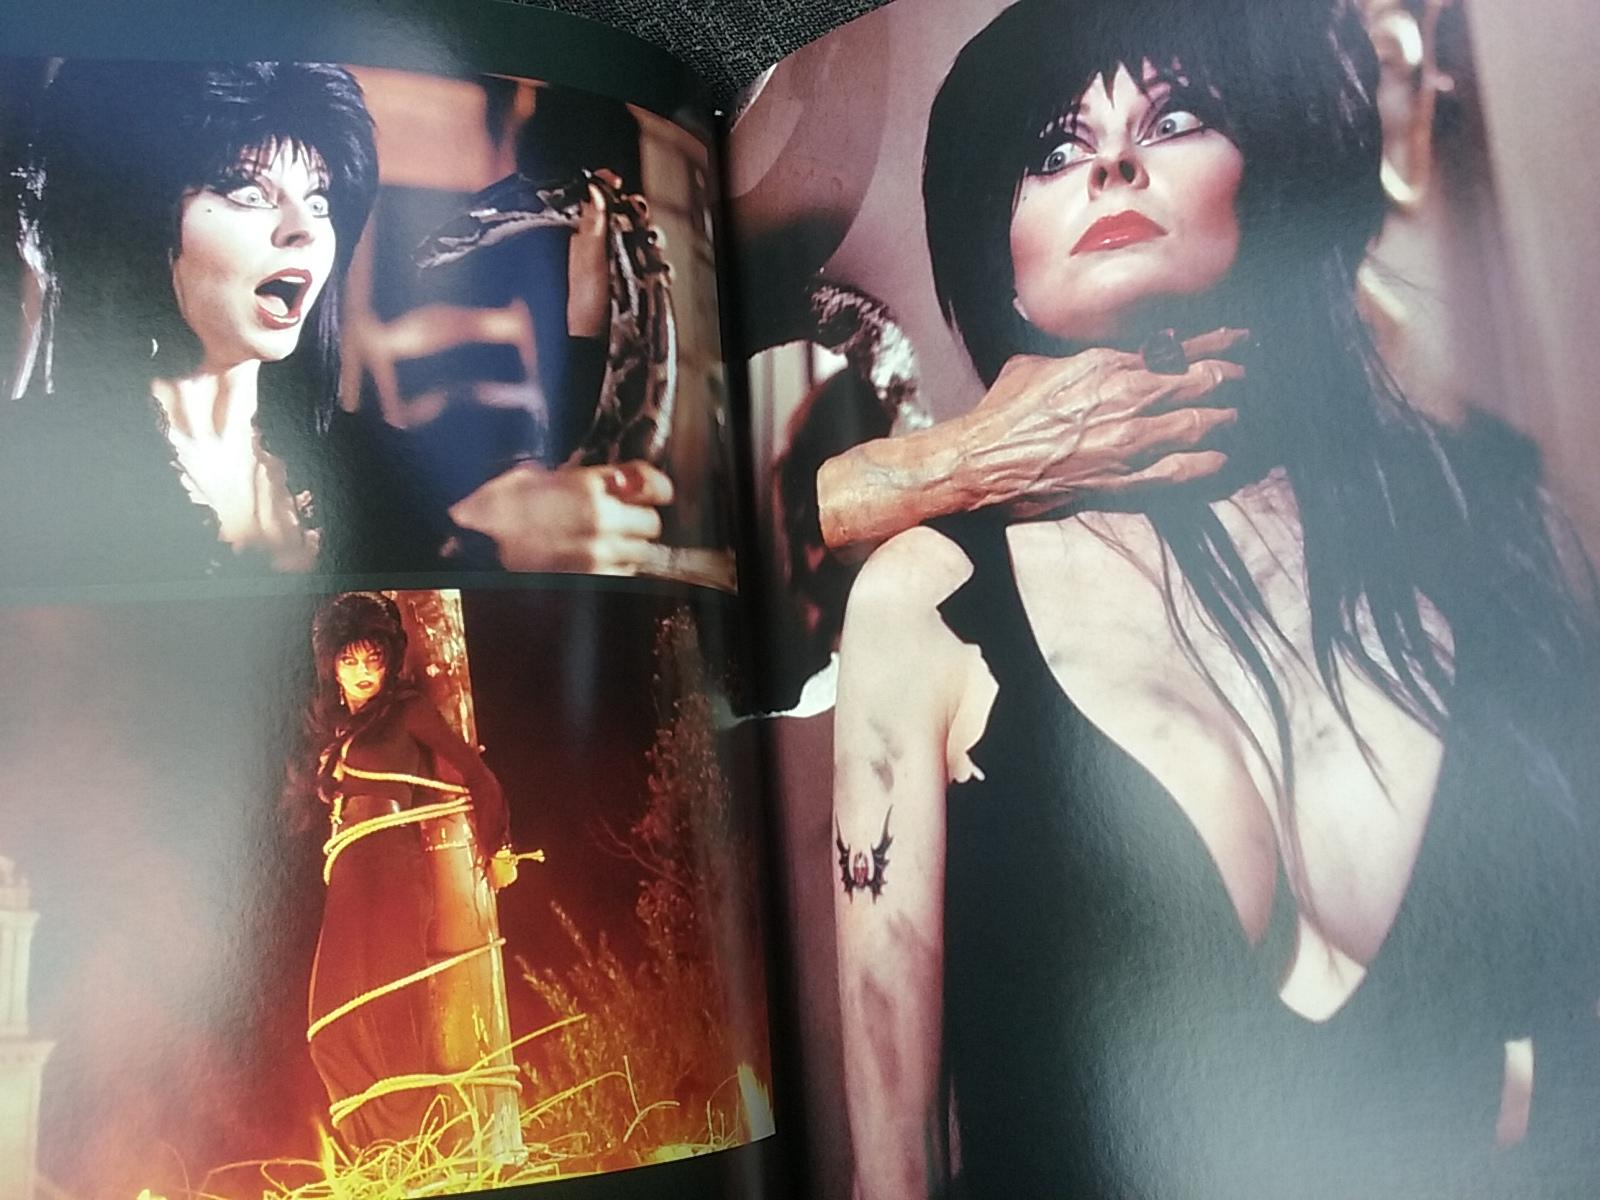 Elvira mistress of the dark scenes — pic 6